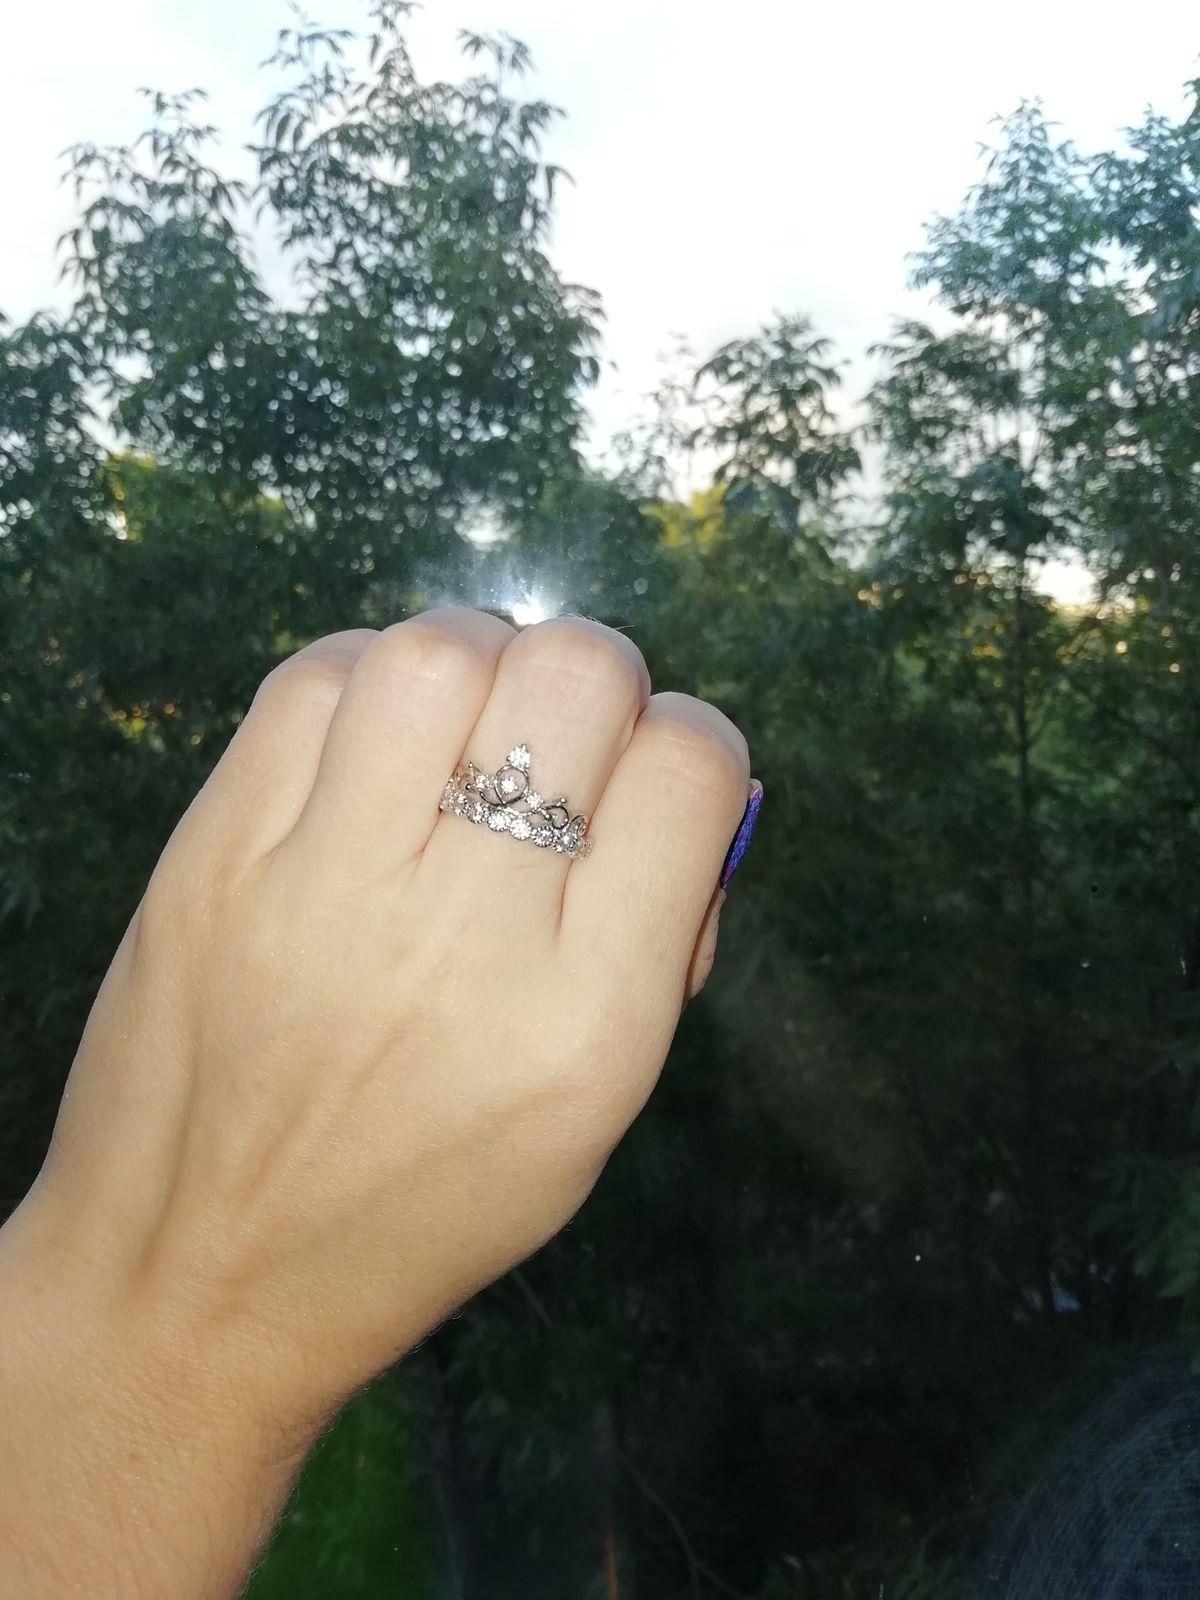 Корона на Ваш пальчик!)